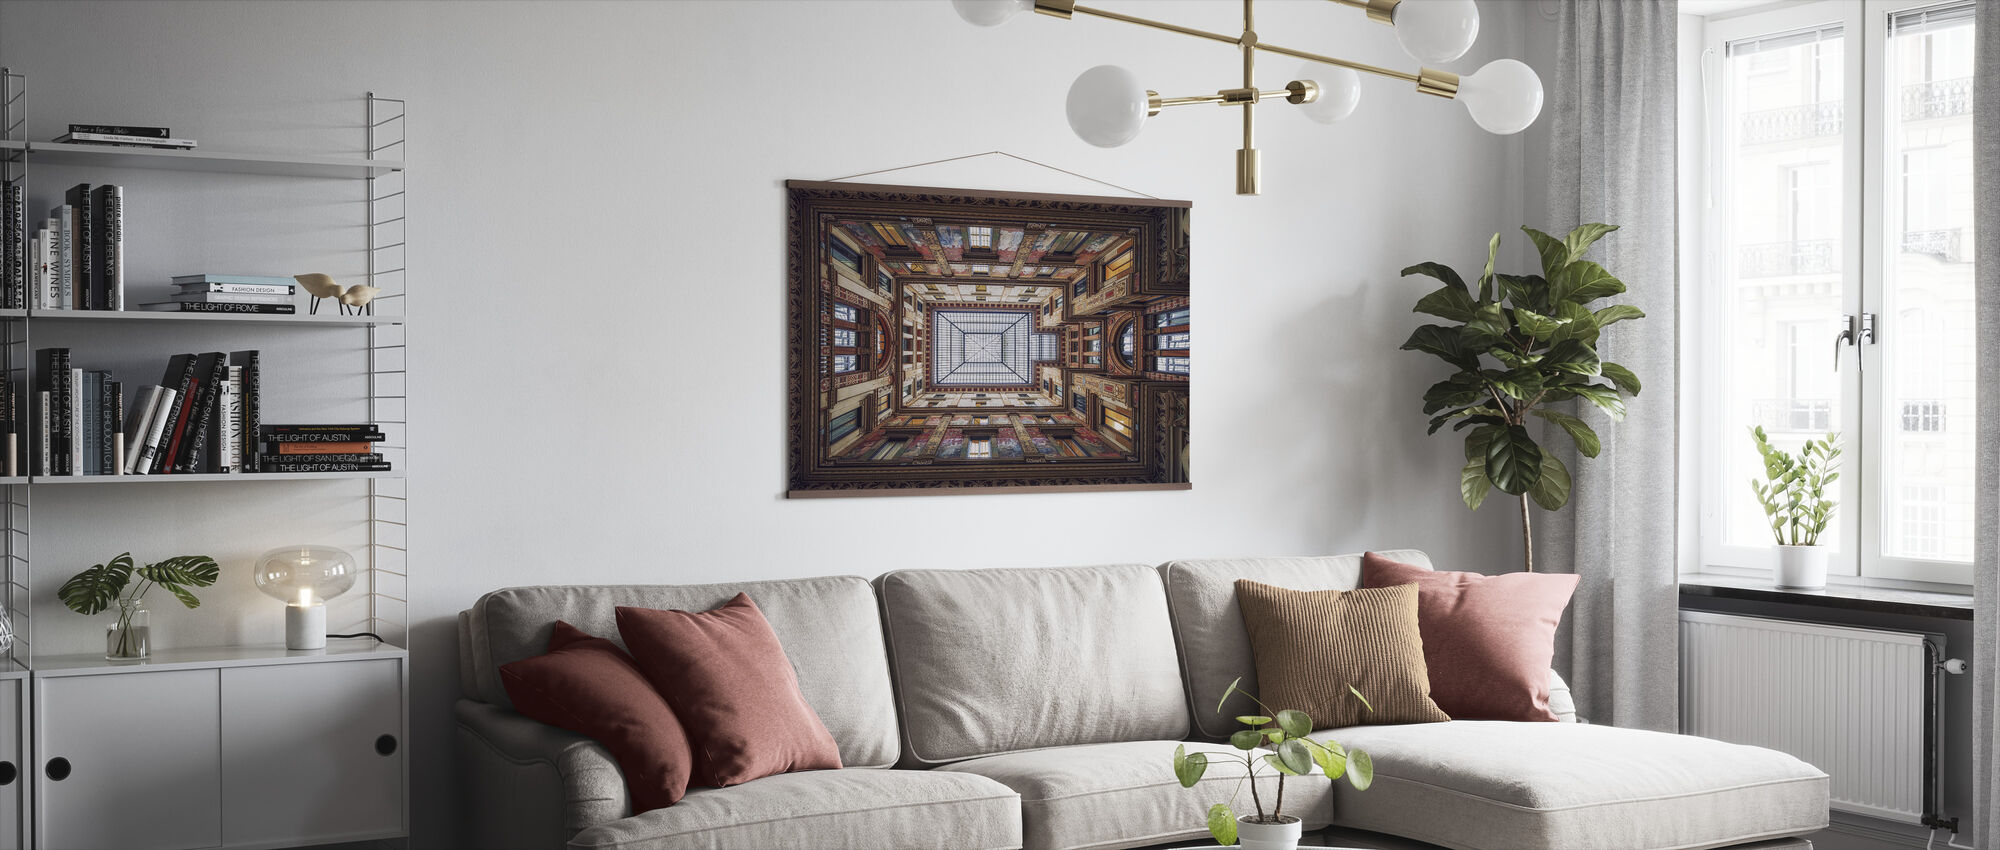 Galleria Sciarra, Rome - Poster - Living Room